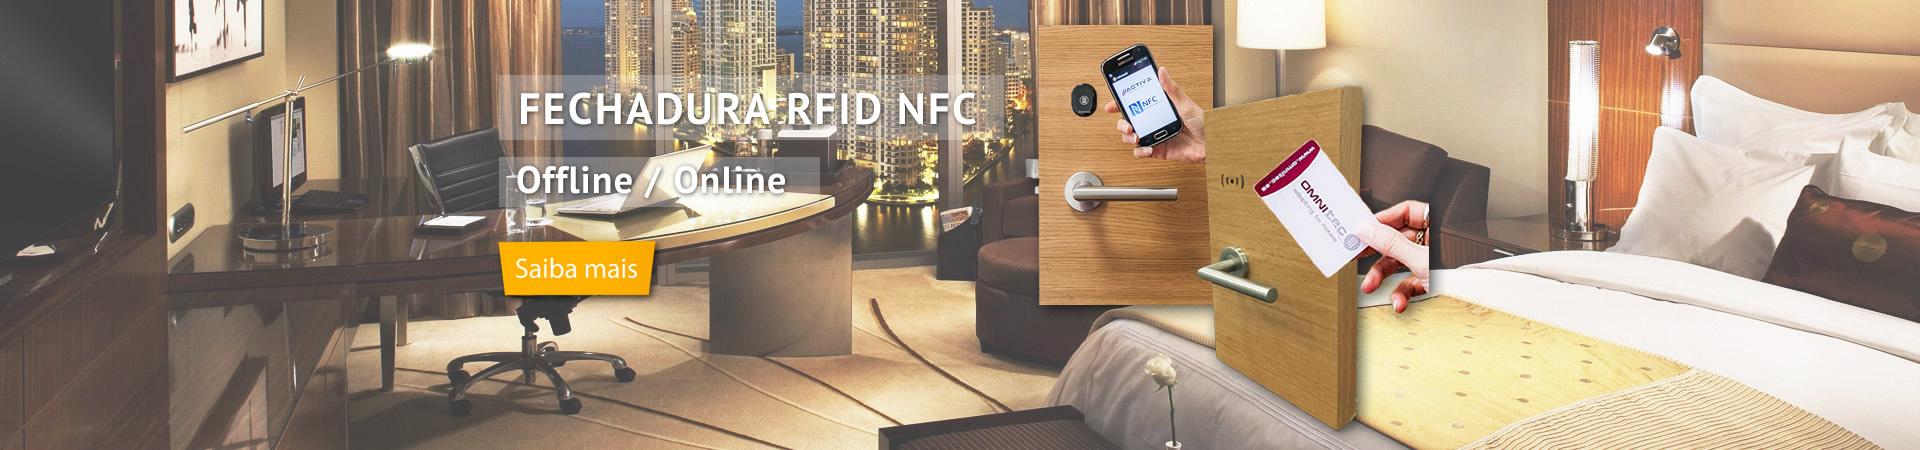 Banner 1 Fechadura Rfid NFC